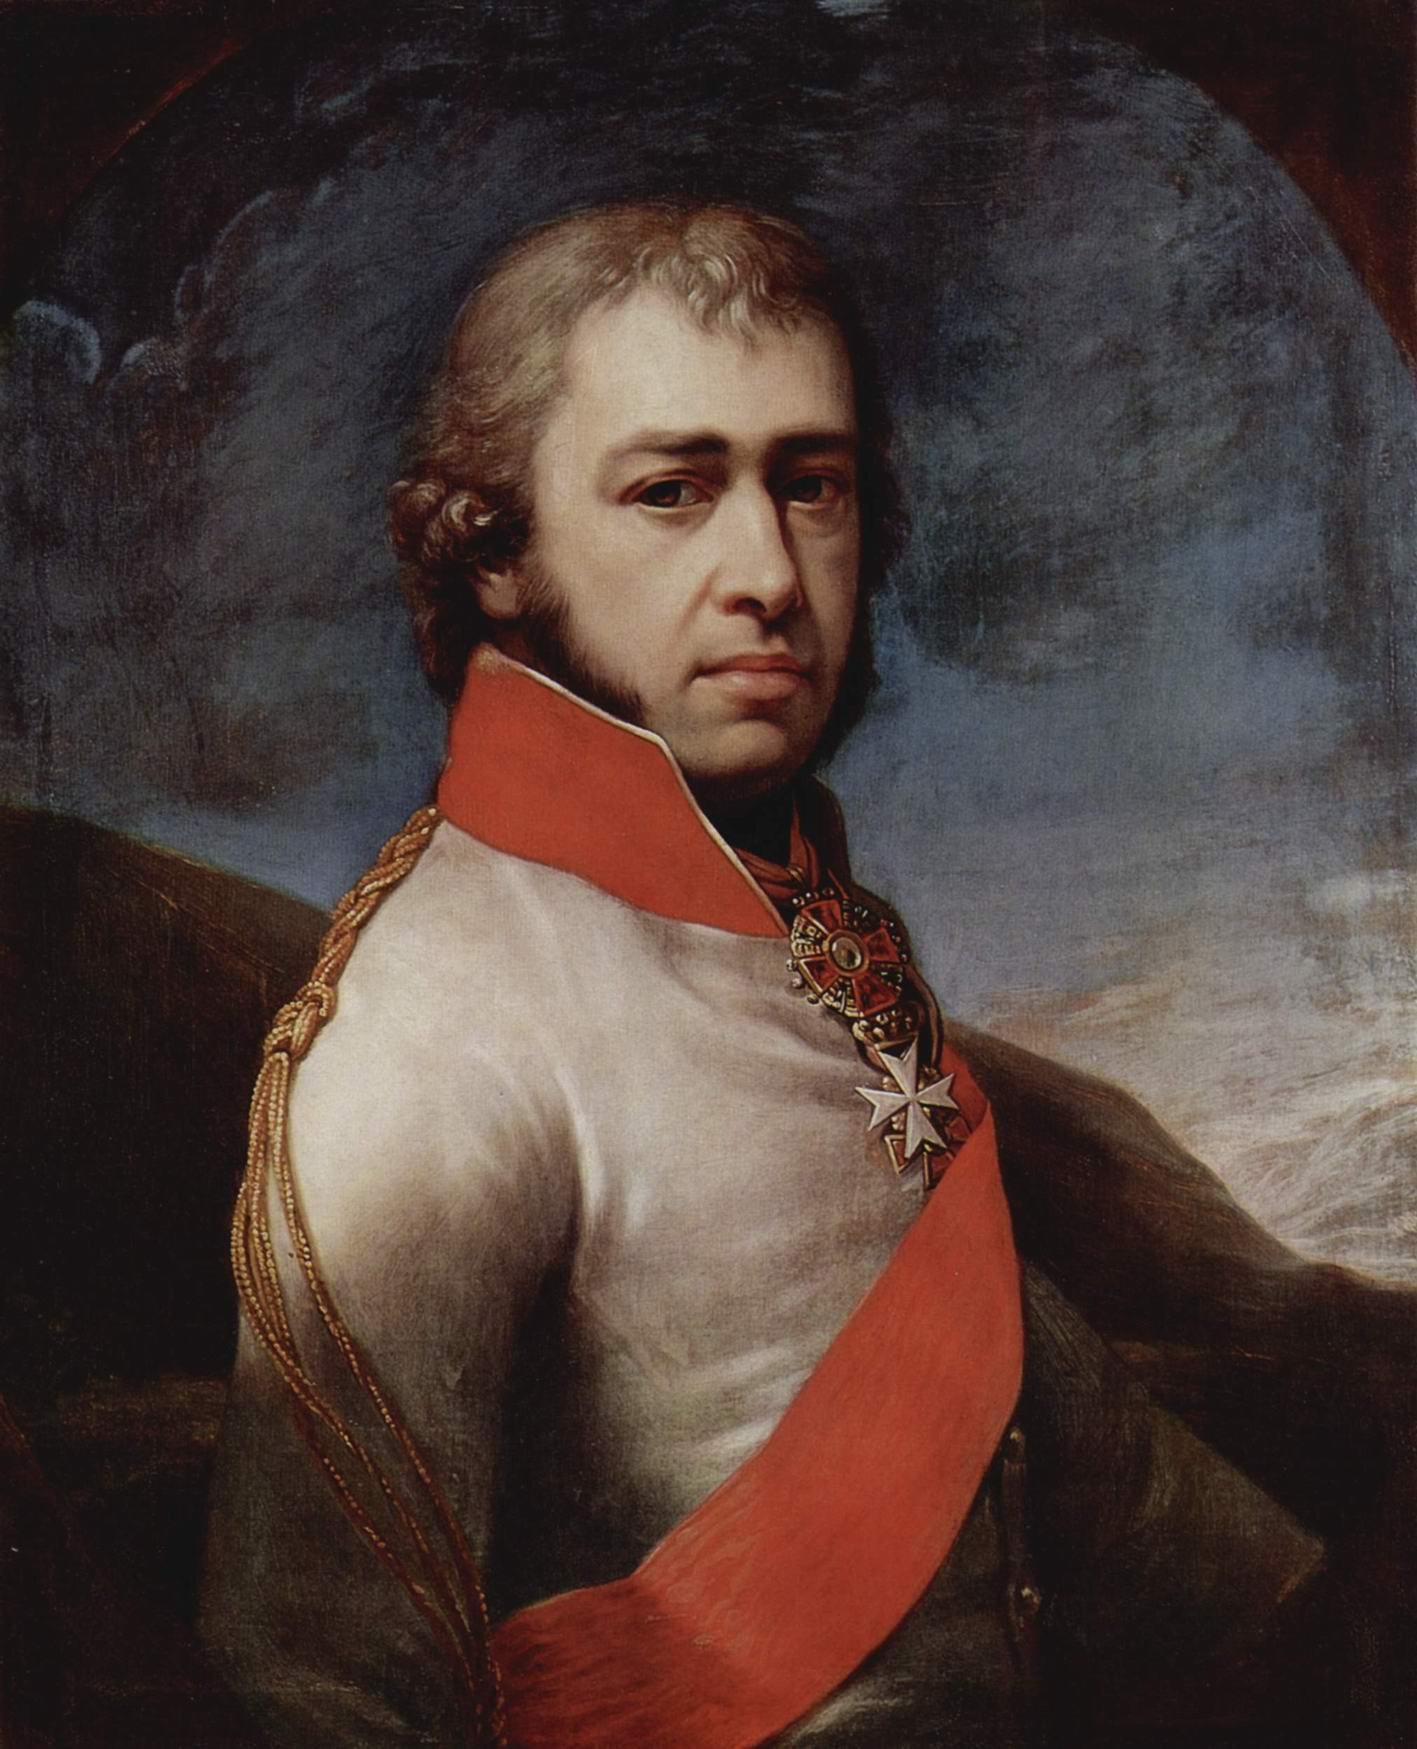 Портрет князя Бориса Голицына, Лампи Иоганн Баптист Старший